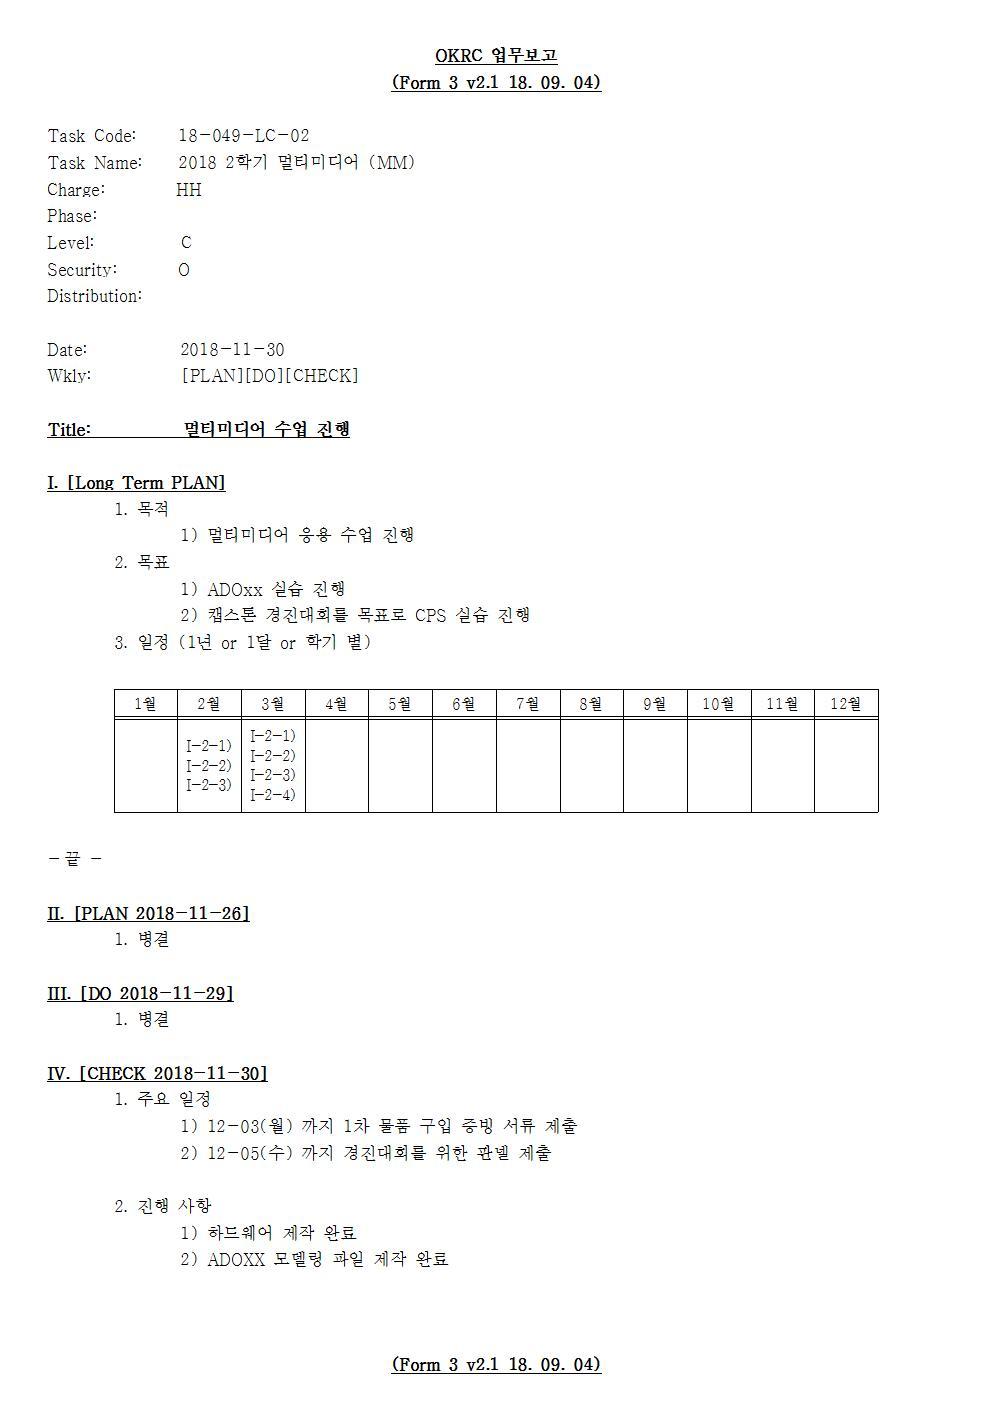 D-[18-049-LC-02]-[MM]-[2018-11-30][HH]001.jpg